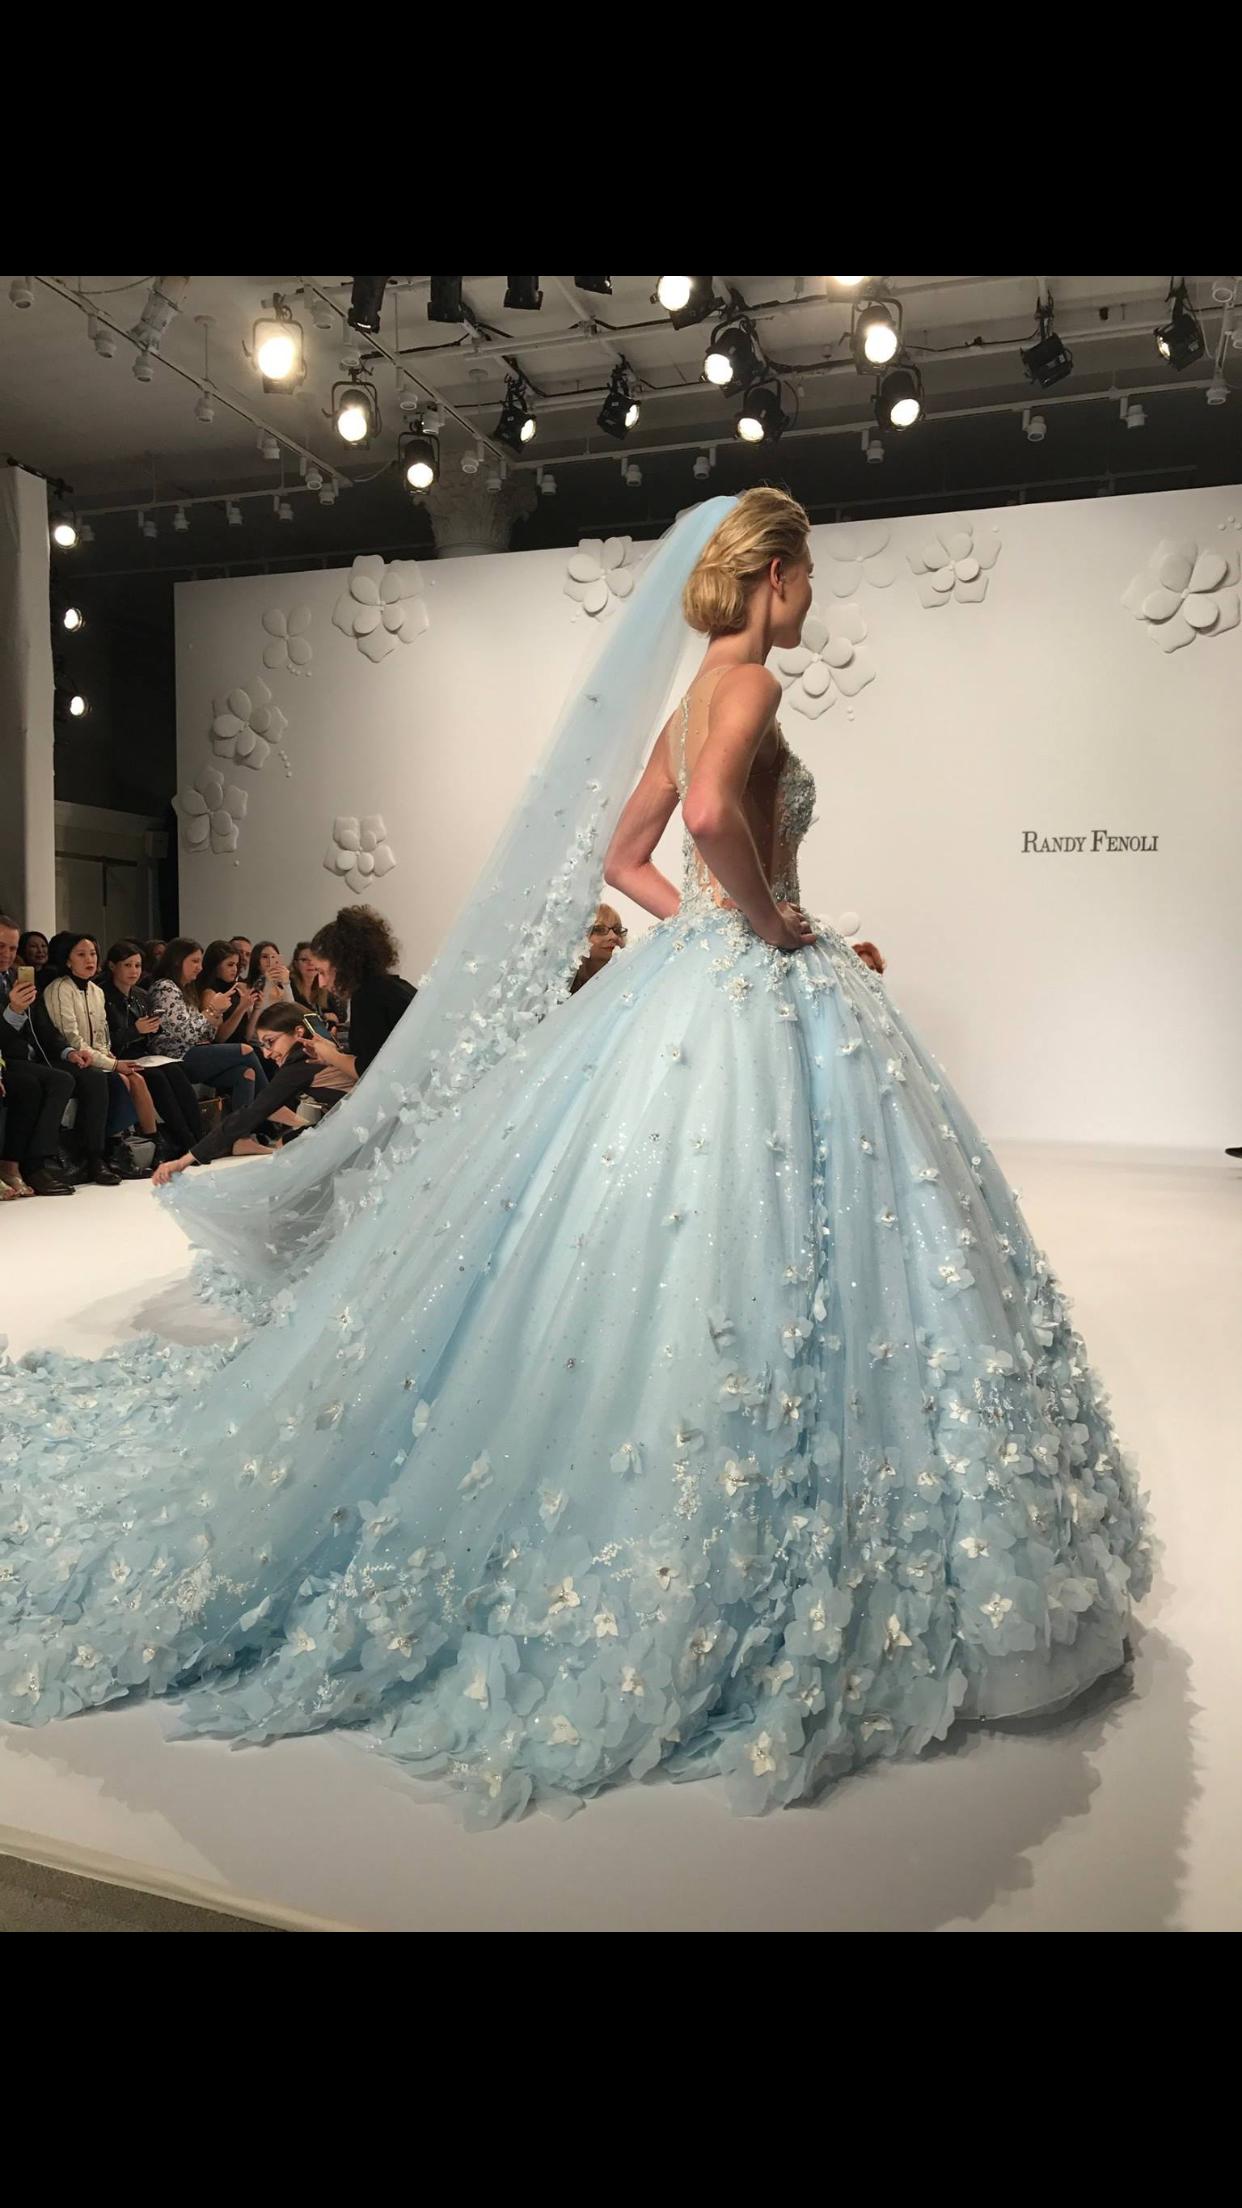 Randy Fenoli wedding dress!! IM IN LOVE! (With images